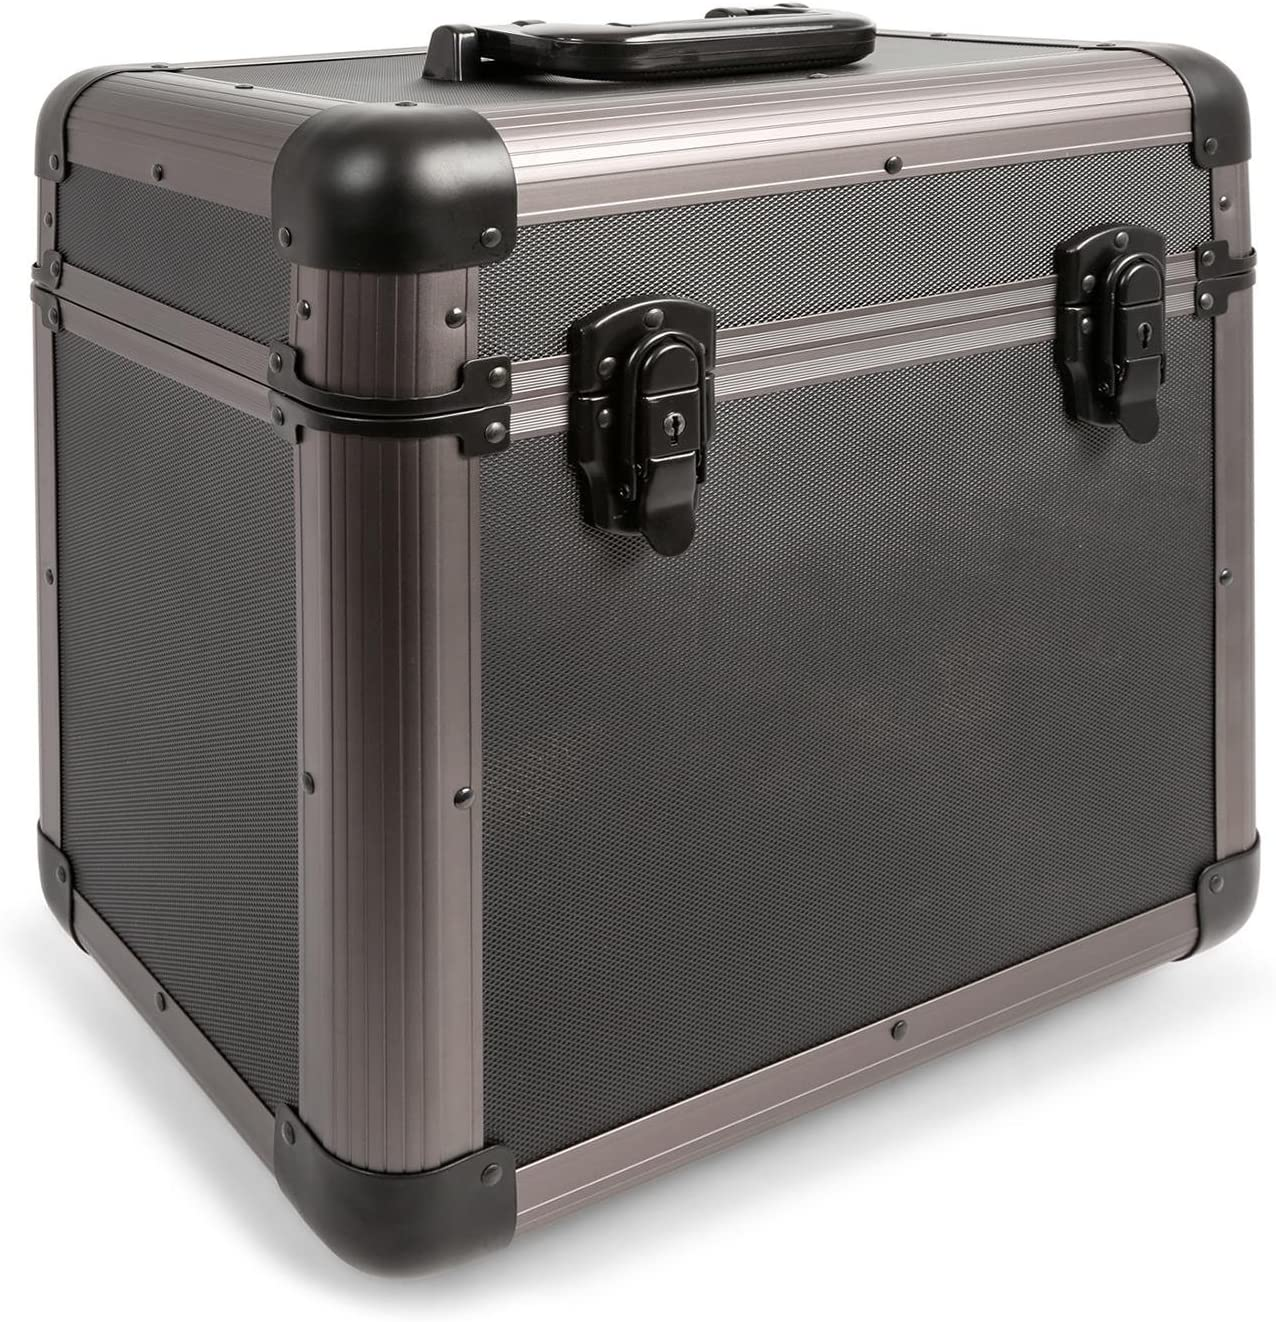 Power Dynamics RC100 Funda Titanio - Caja (Funda, Titanio, 355 mm, 310 mm, 390 mm, 3 kg)